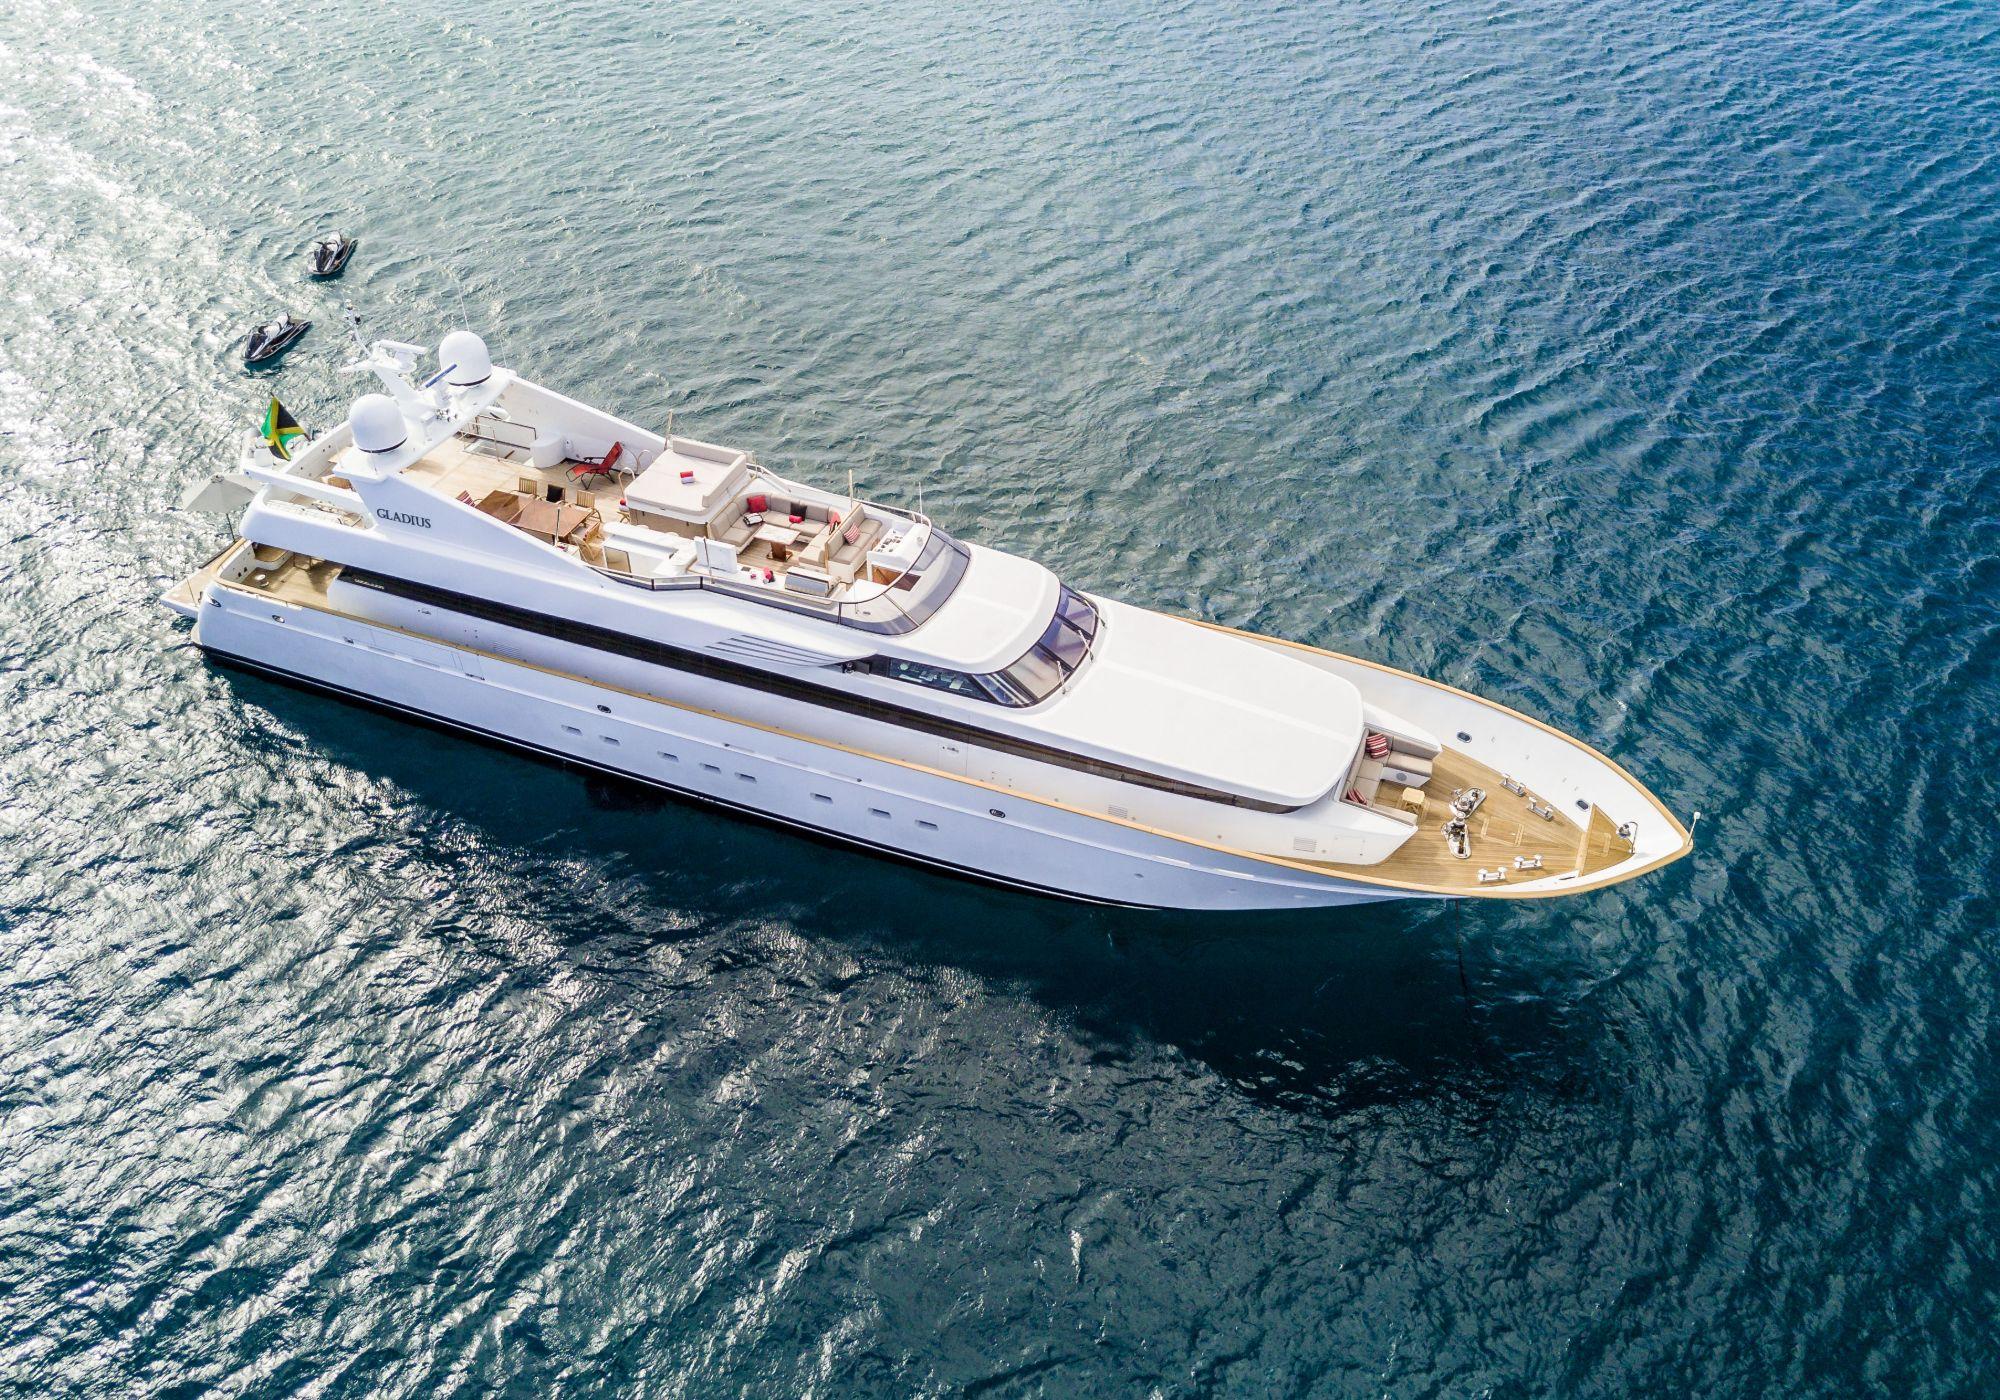 Motor Yacht GLADIUS for Charter with SuperYachtsMonaco